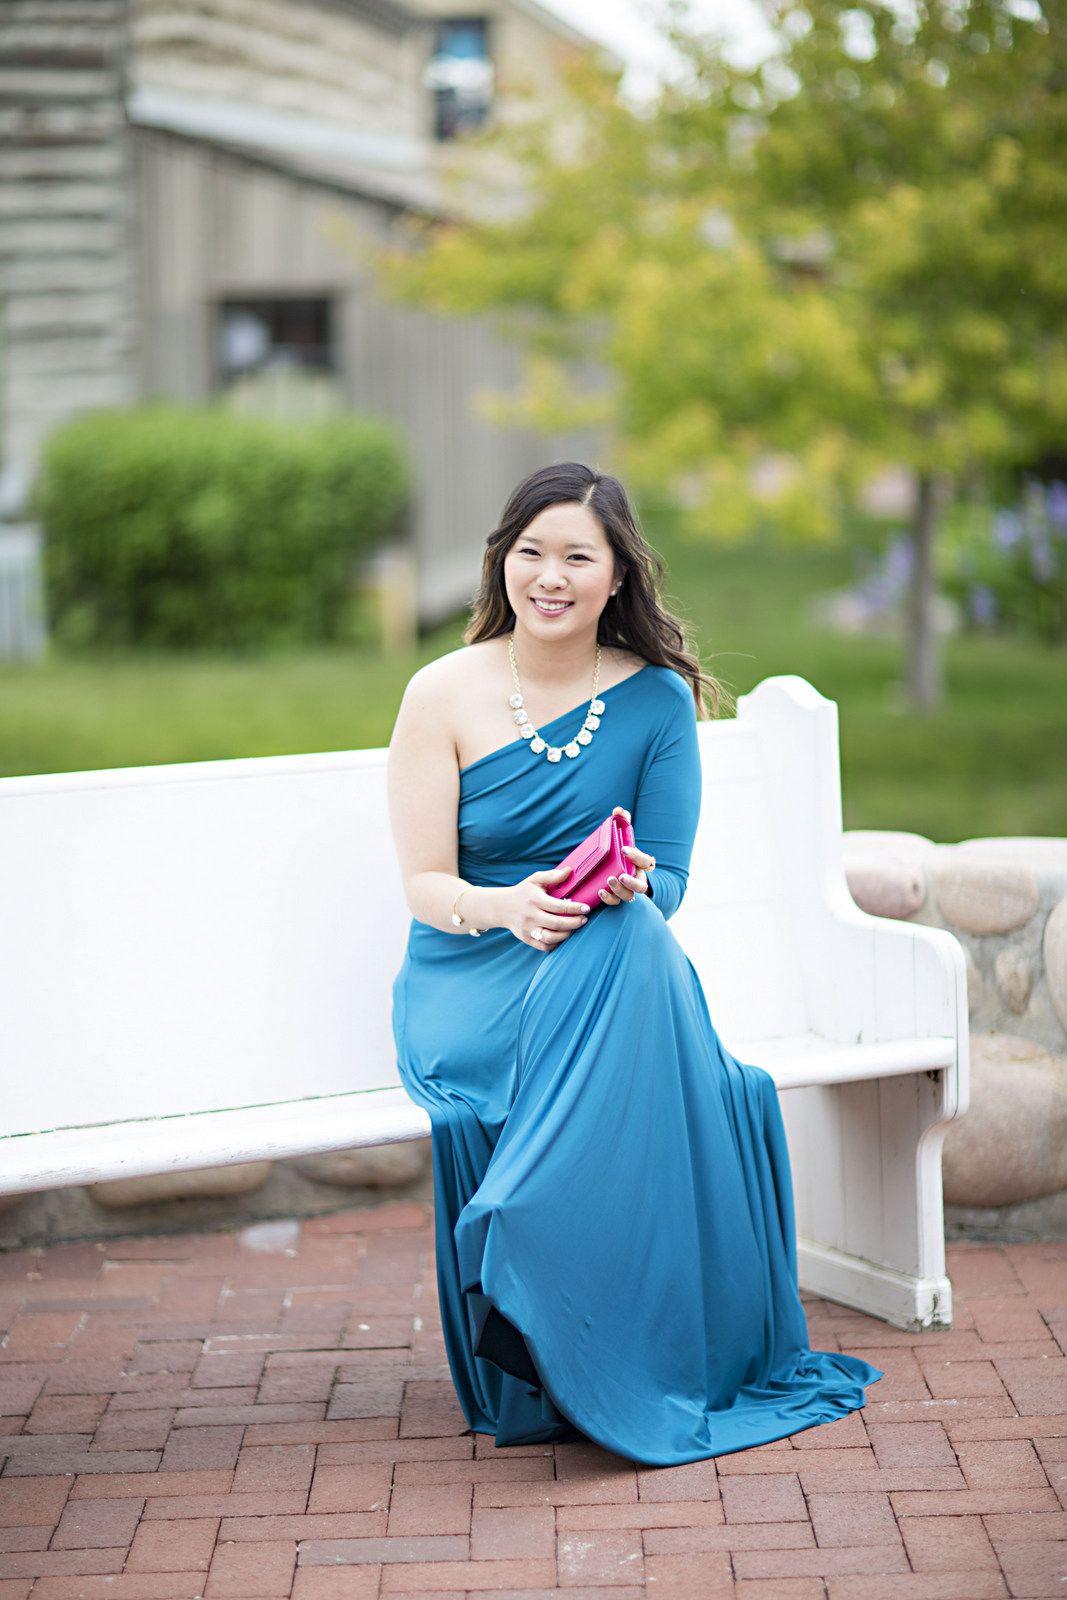 ab0330320d6 Four Ways To Style The Henkaa Iris Convertible Dress